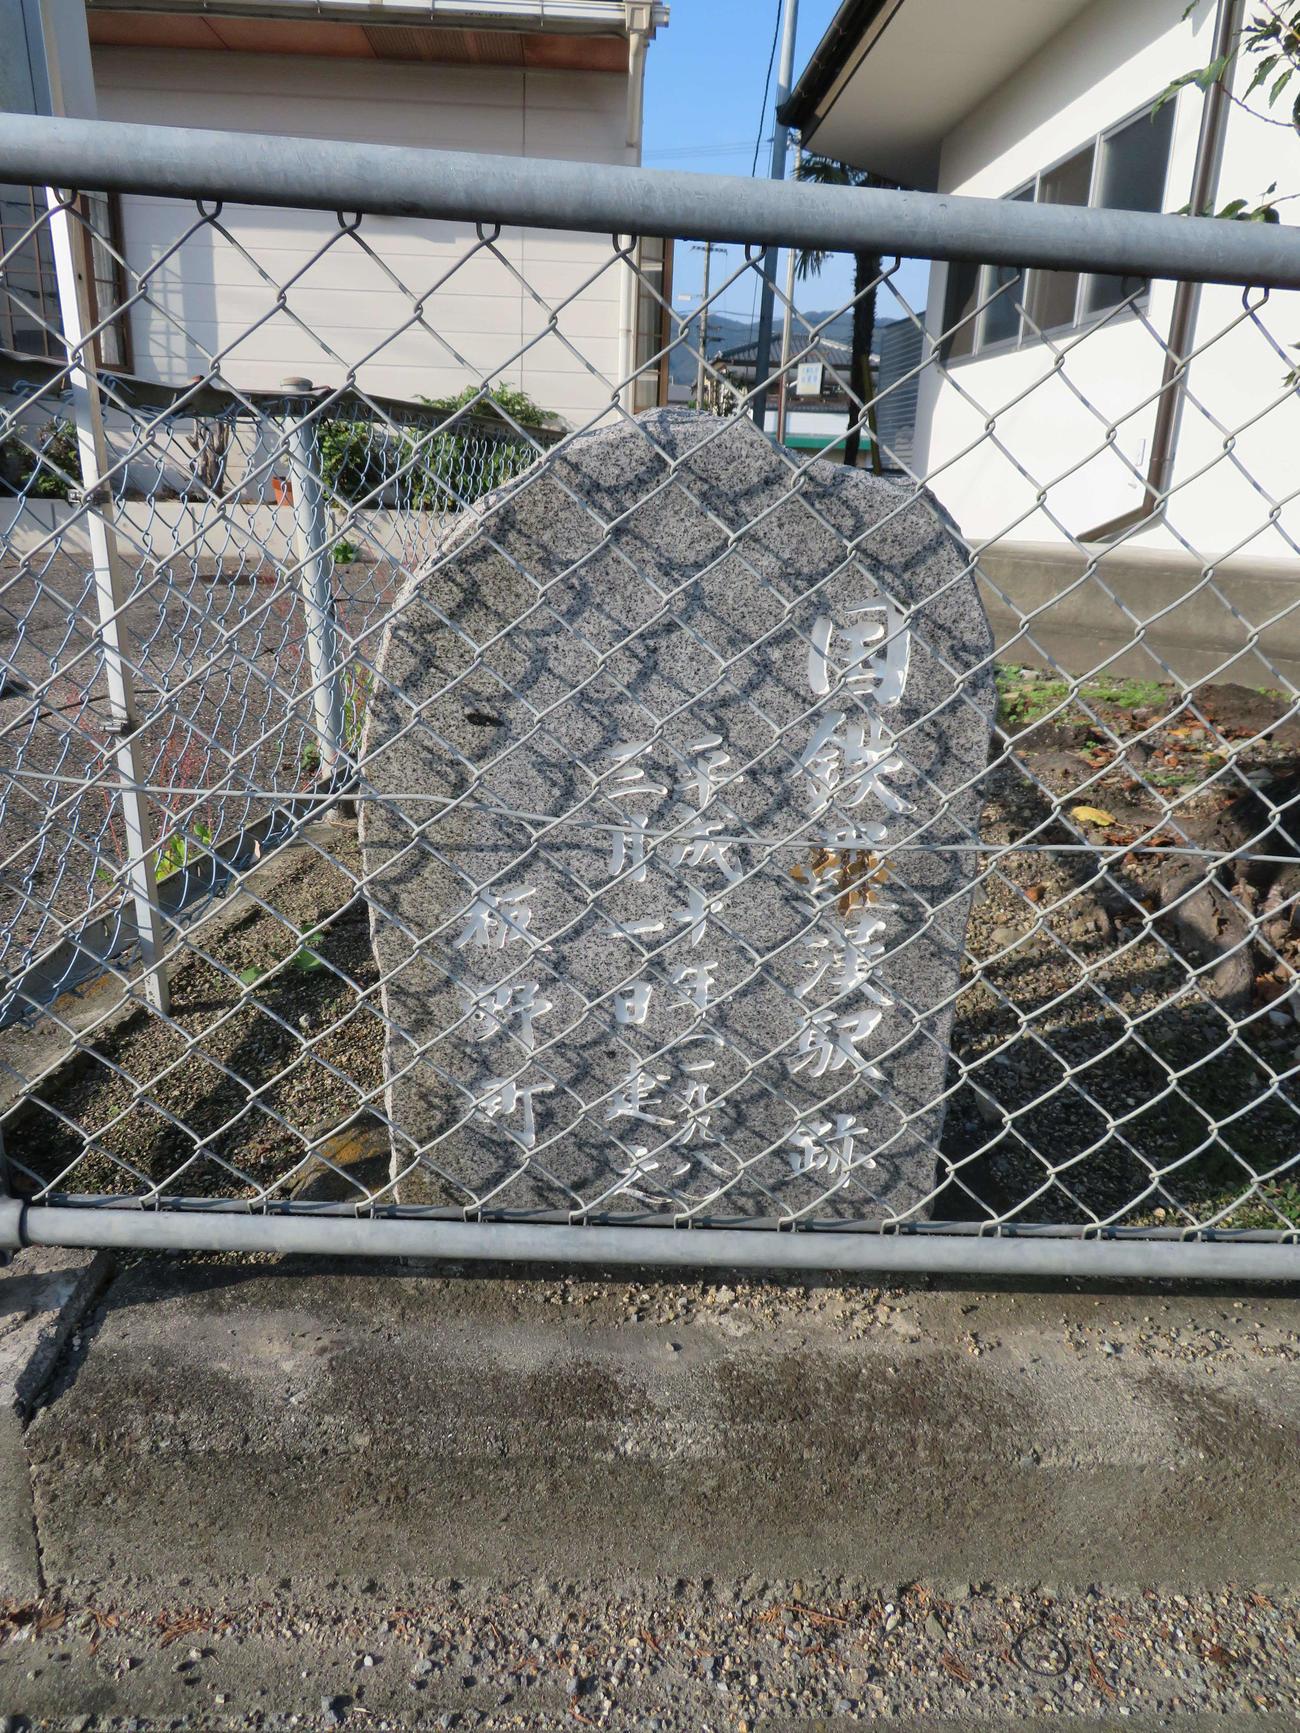 〈9〉国鉄羅漢駅跡の石碑